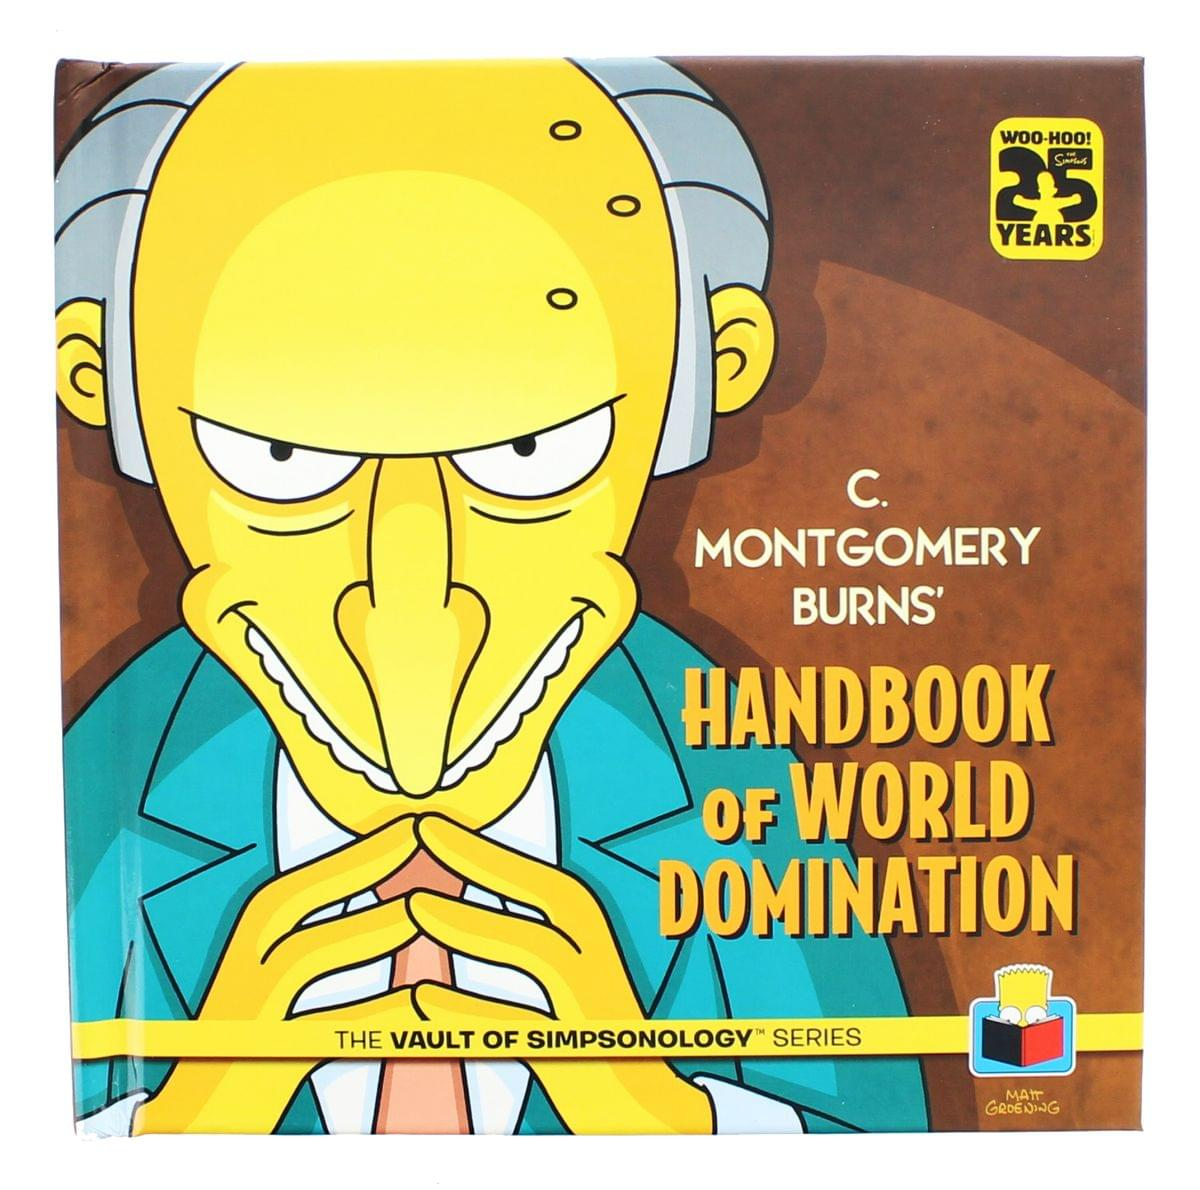 The Simpsons: C. Montgomery Burns' Handbook of World Domination